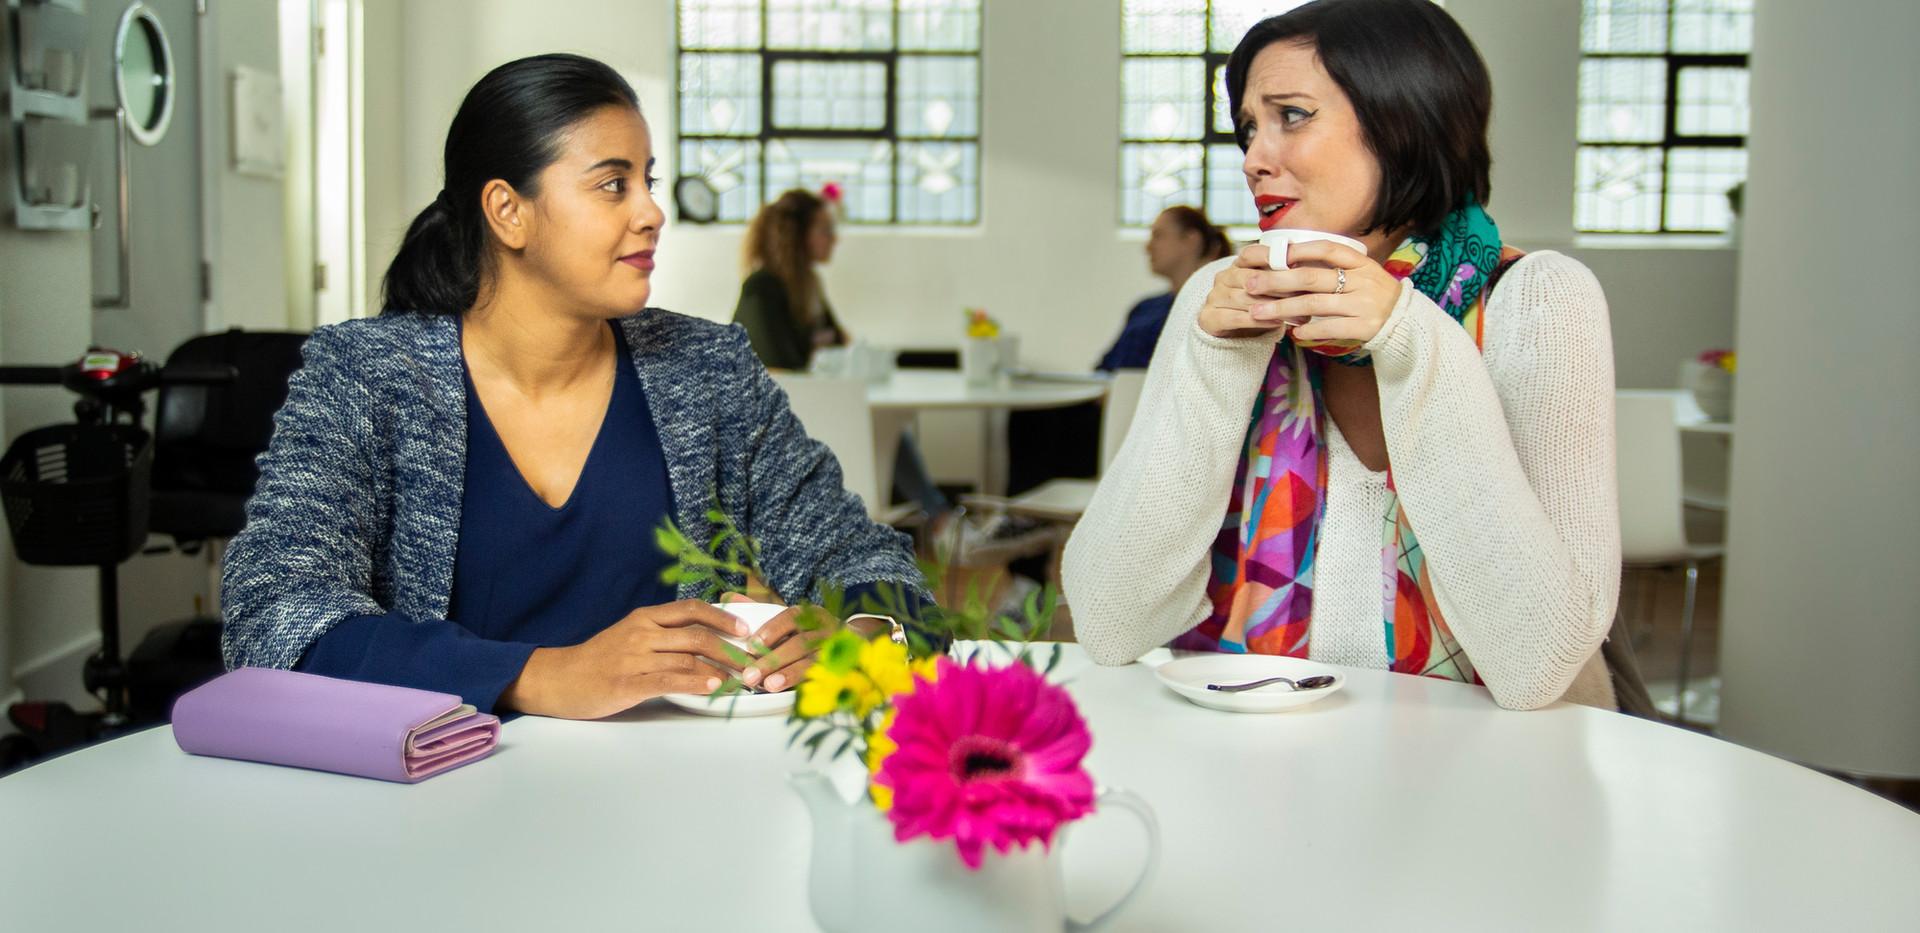 LIFE Centre Pooja & Tess chat.jpg